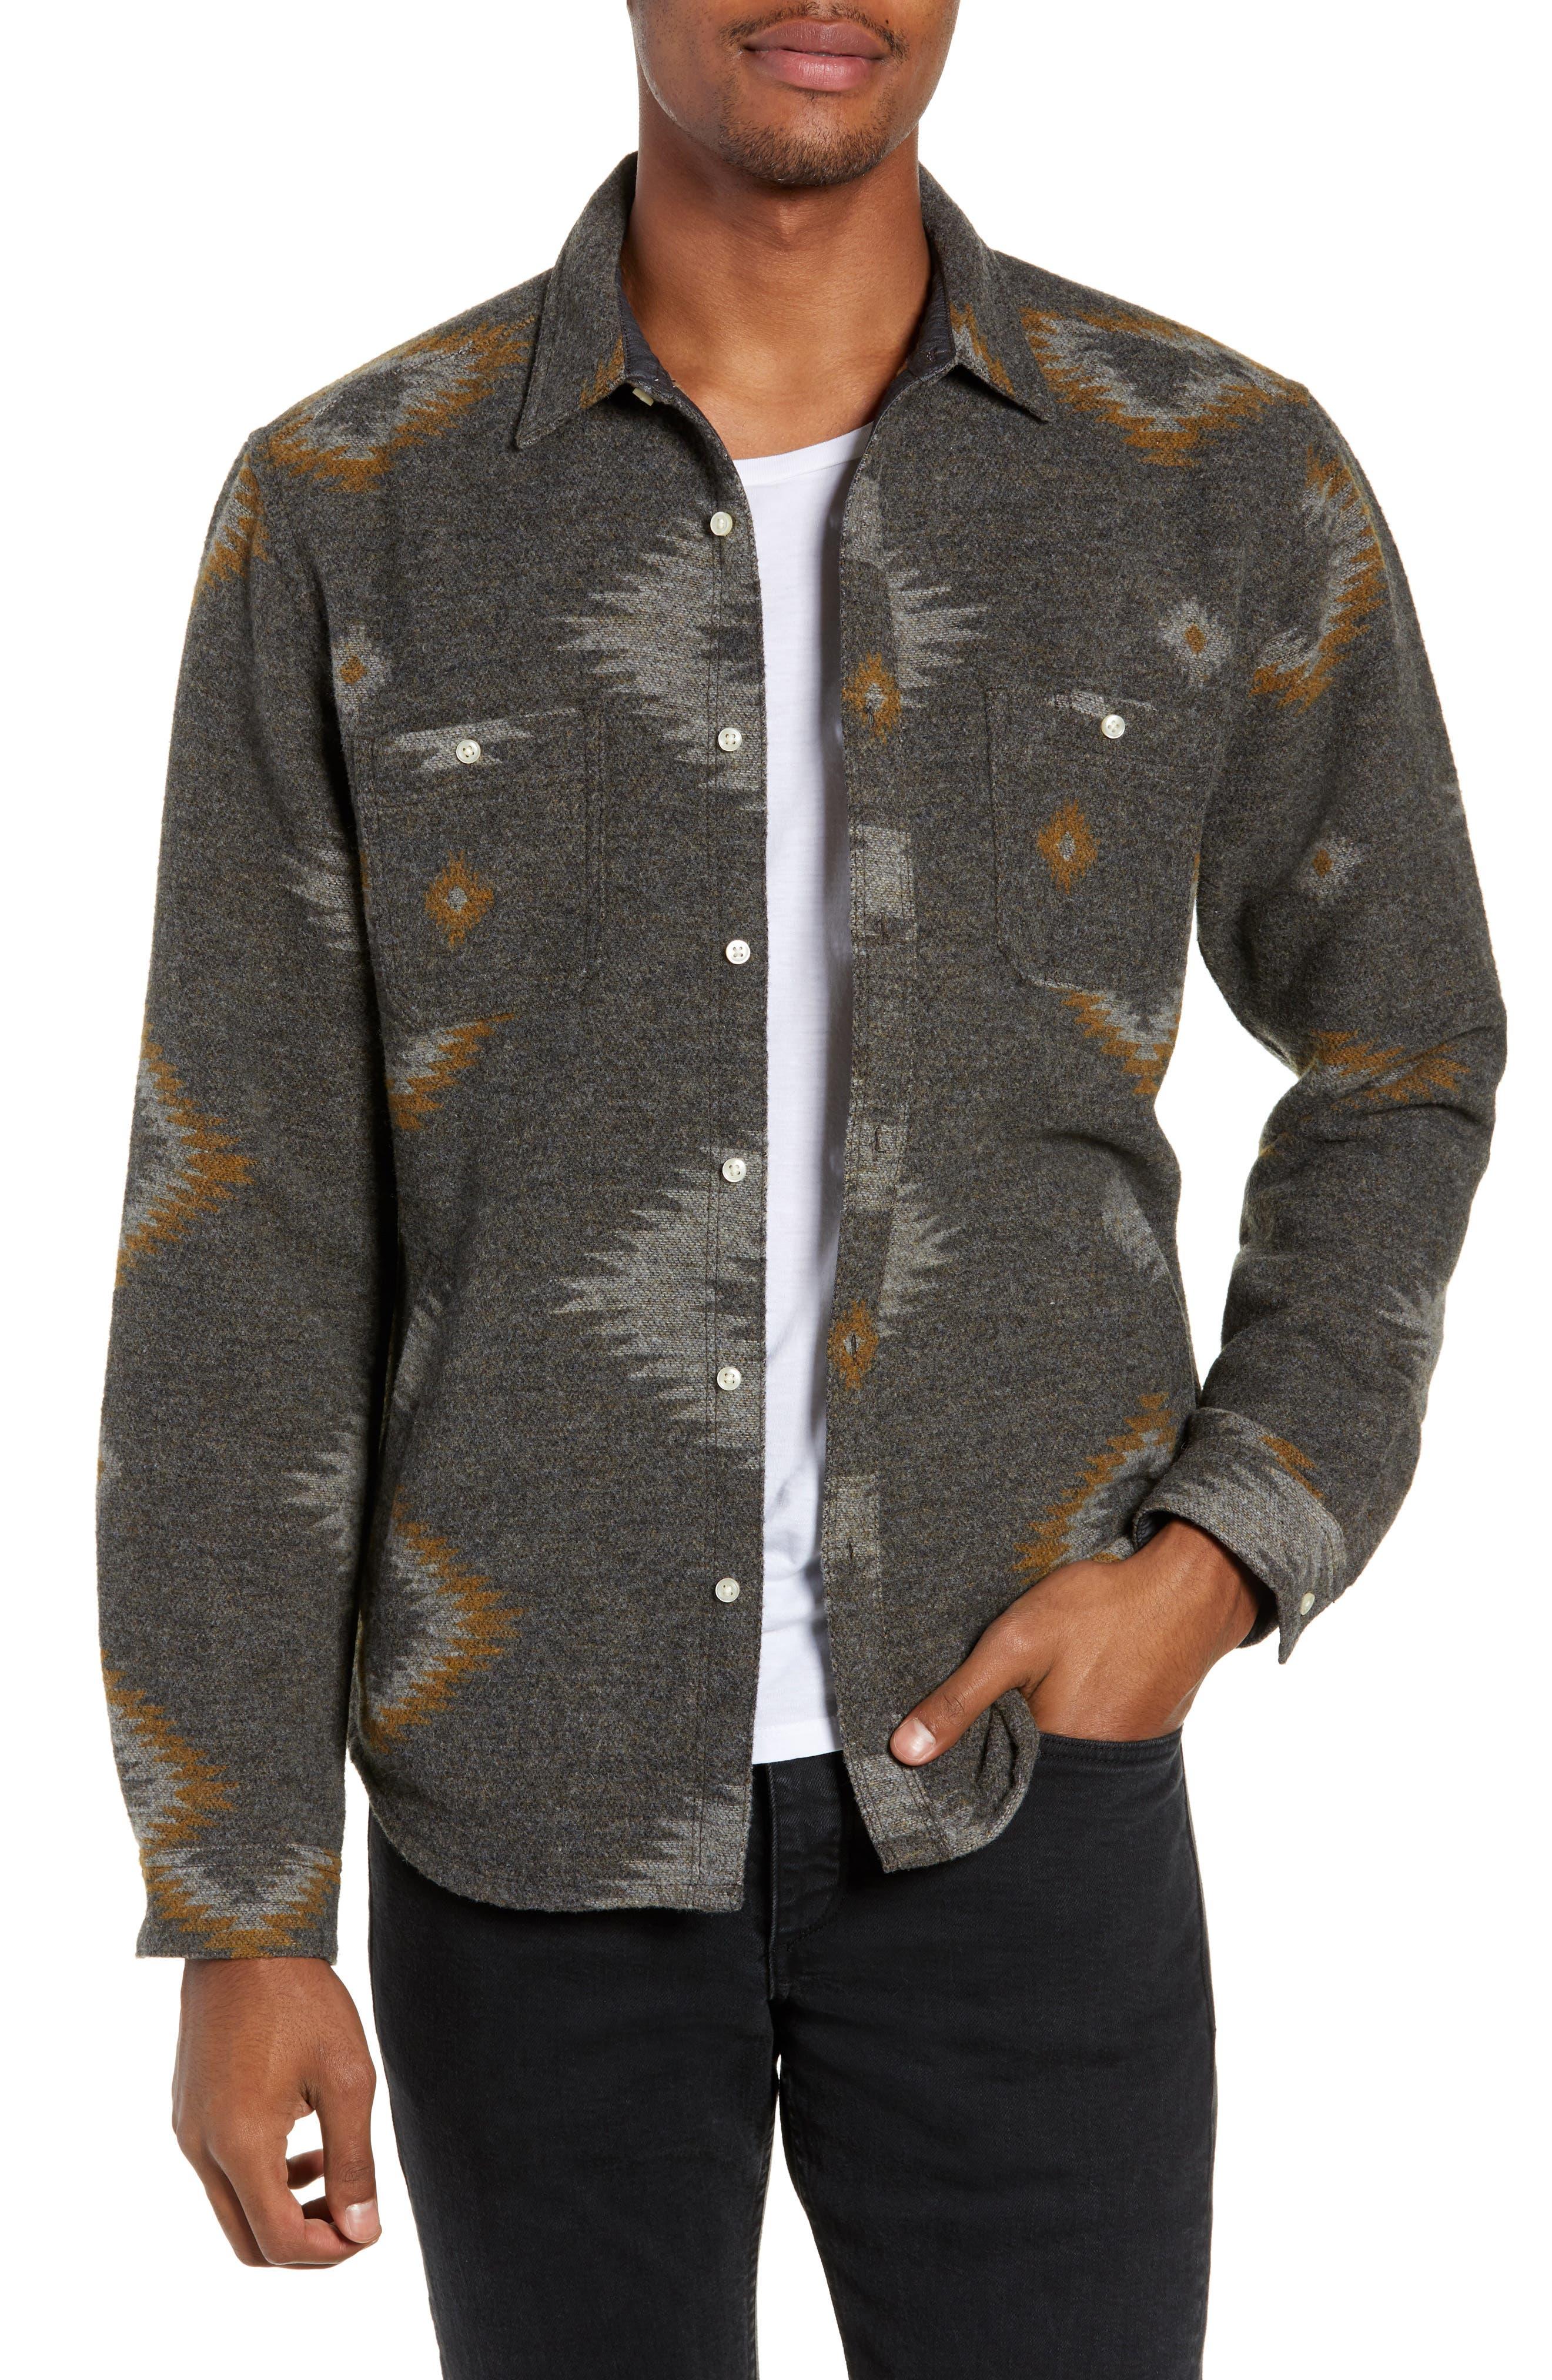 Warrior Regular Fit Wool Blend Shirt Jacket,                             Main thumbnail 1, color,                             HEATHER CHARCOAL